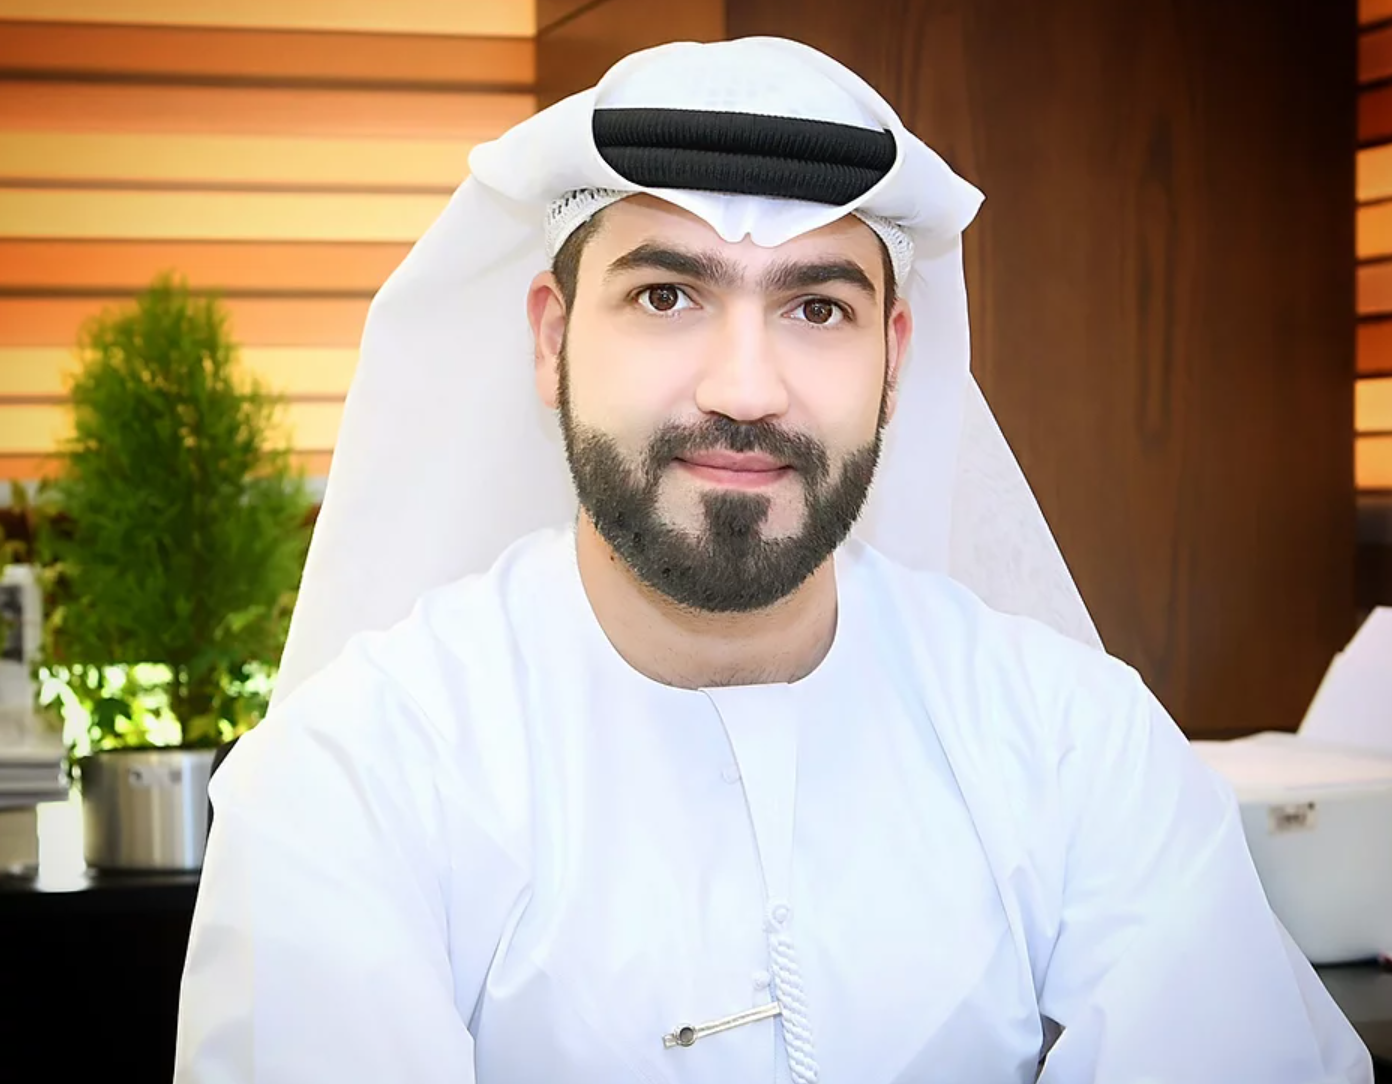 Ahmad Darwish Ali Al Emadi